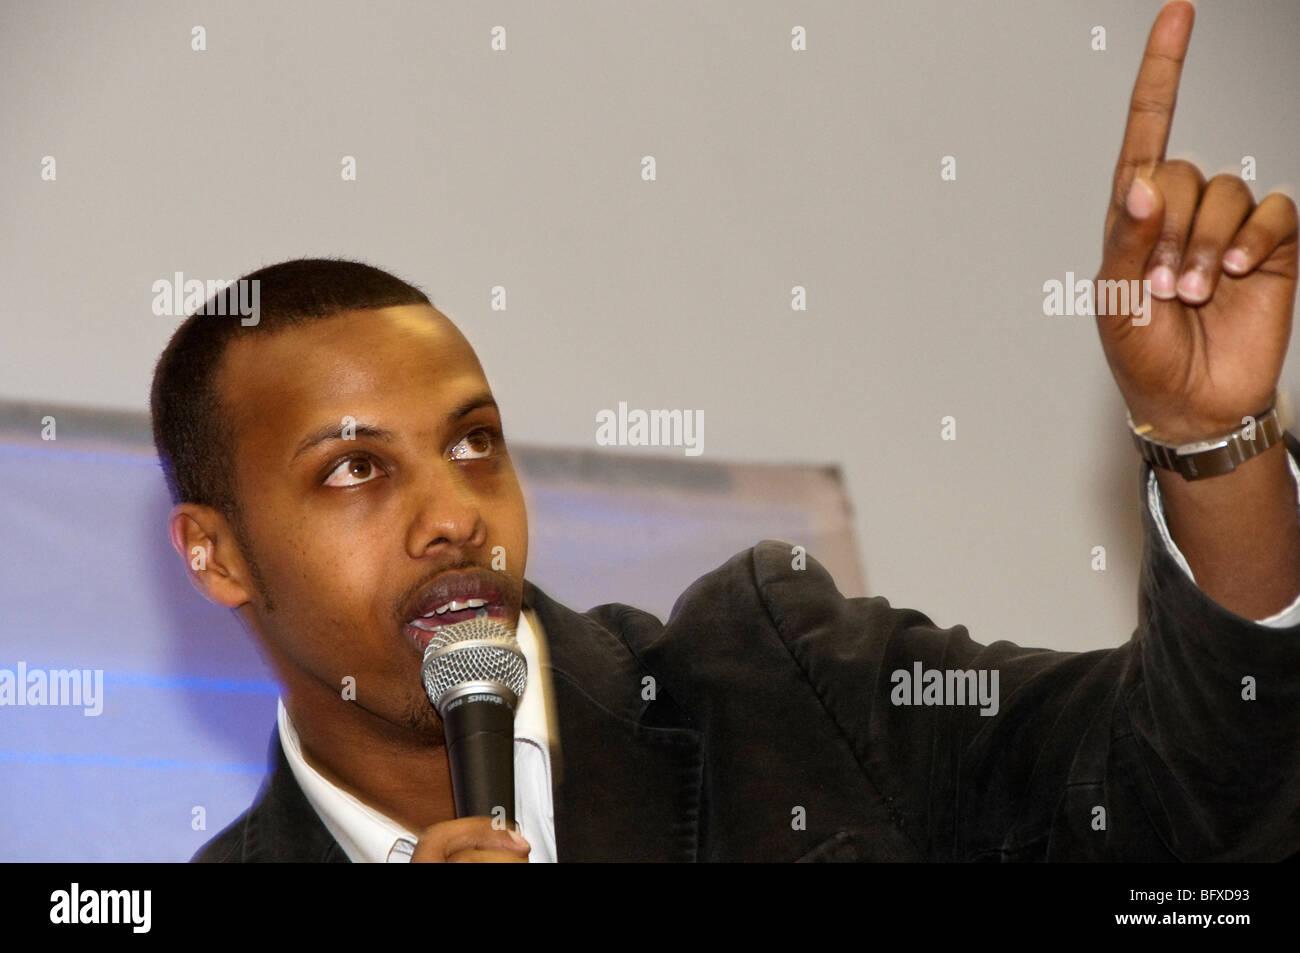 Black Comedian Prince Abdi At Eid Milad Un Nabi Celebrations At Sunni Muslim Association Tooting London